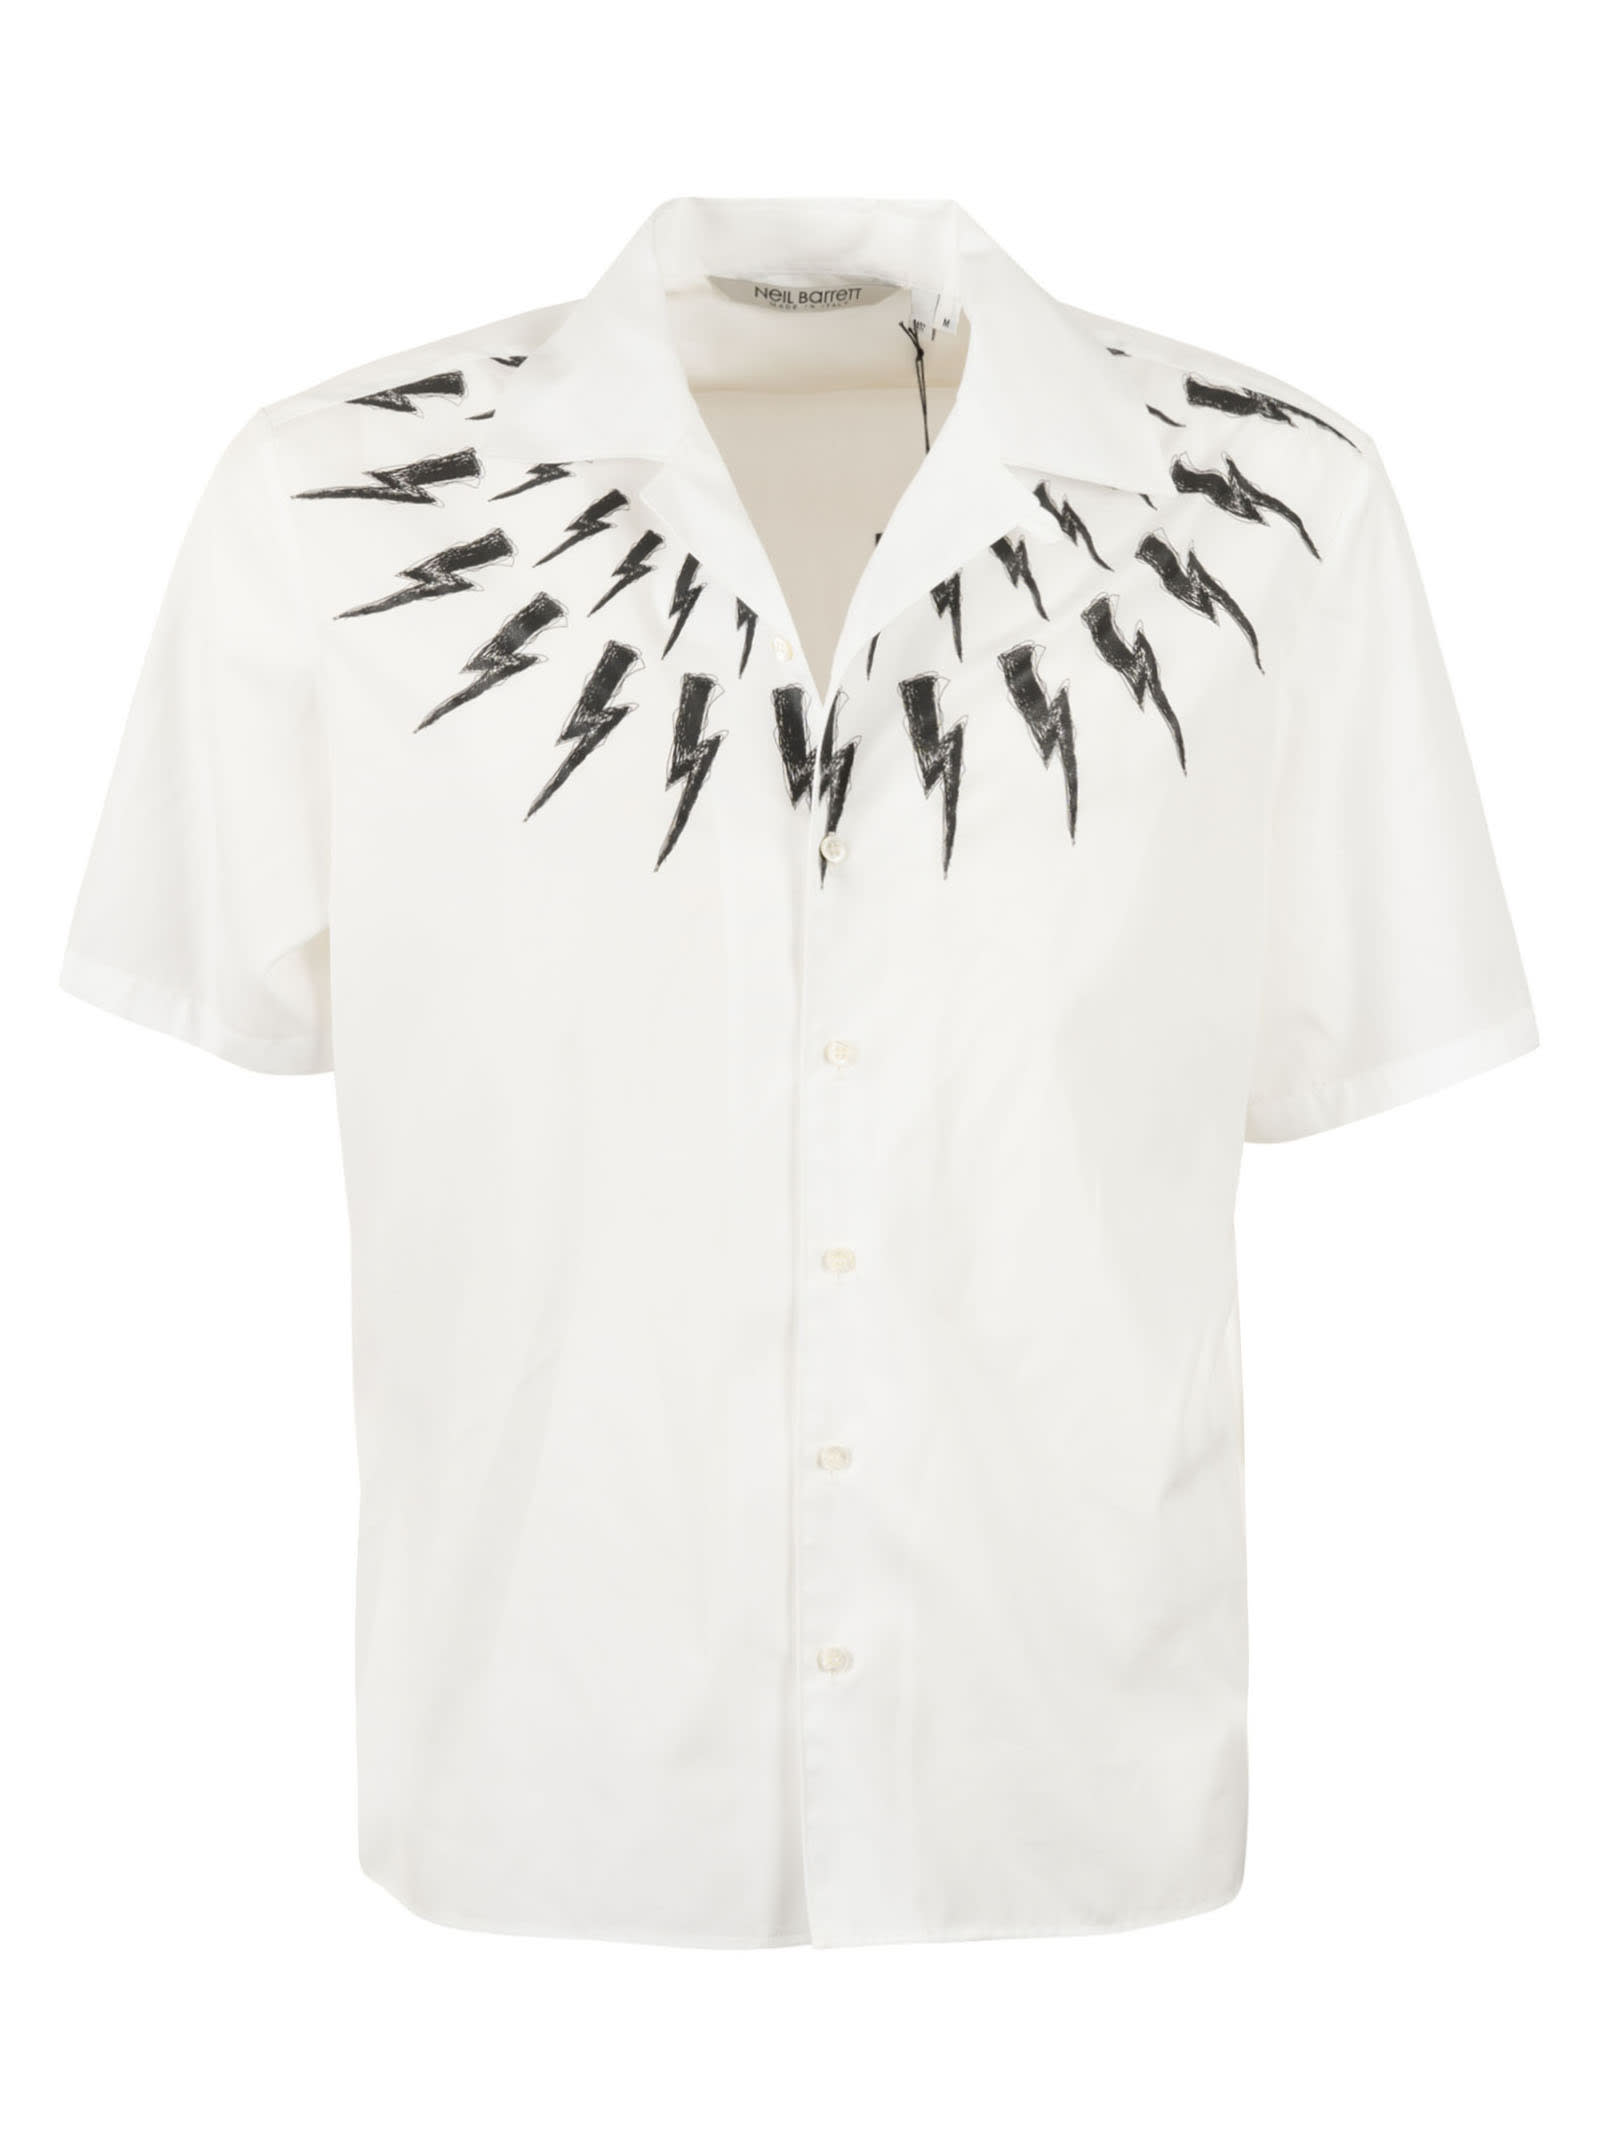 Neil Barrett Shirts THUNDERBOLT SHIRT